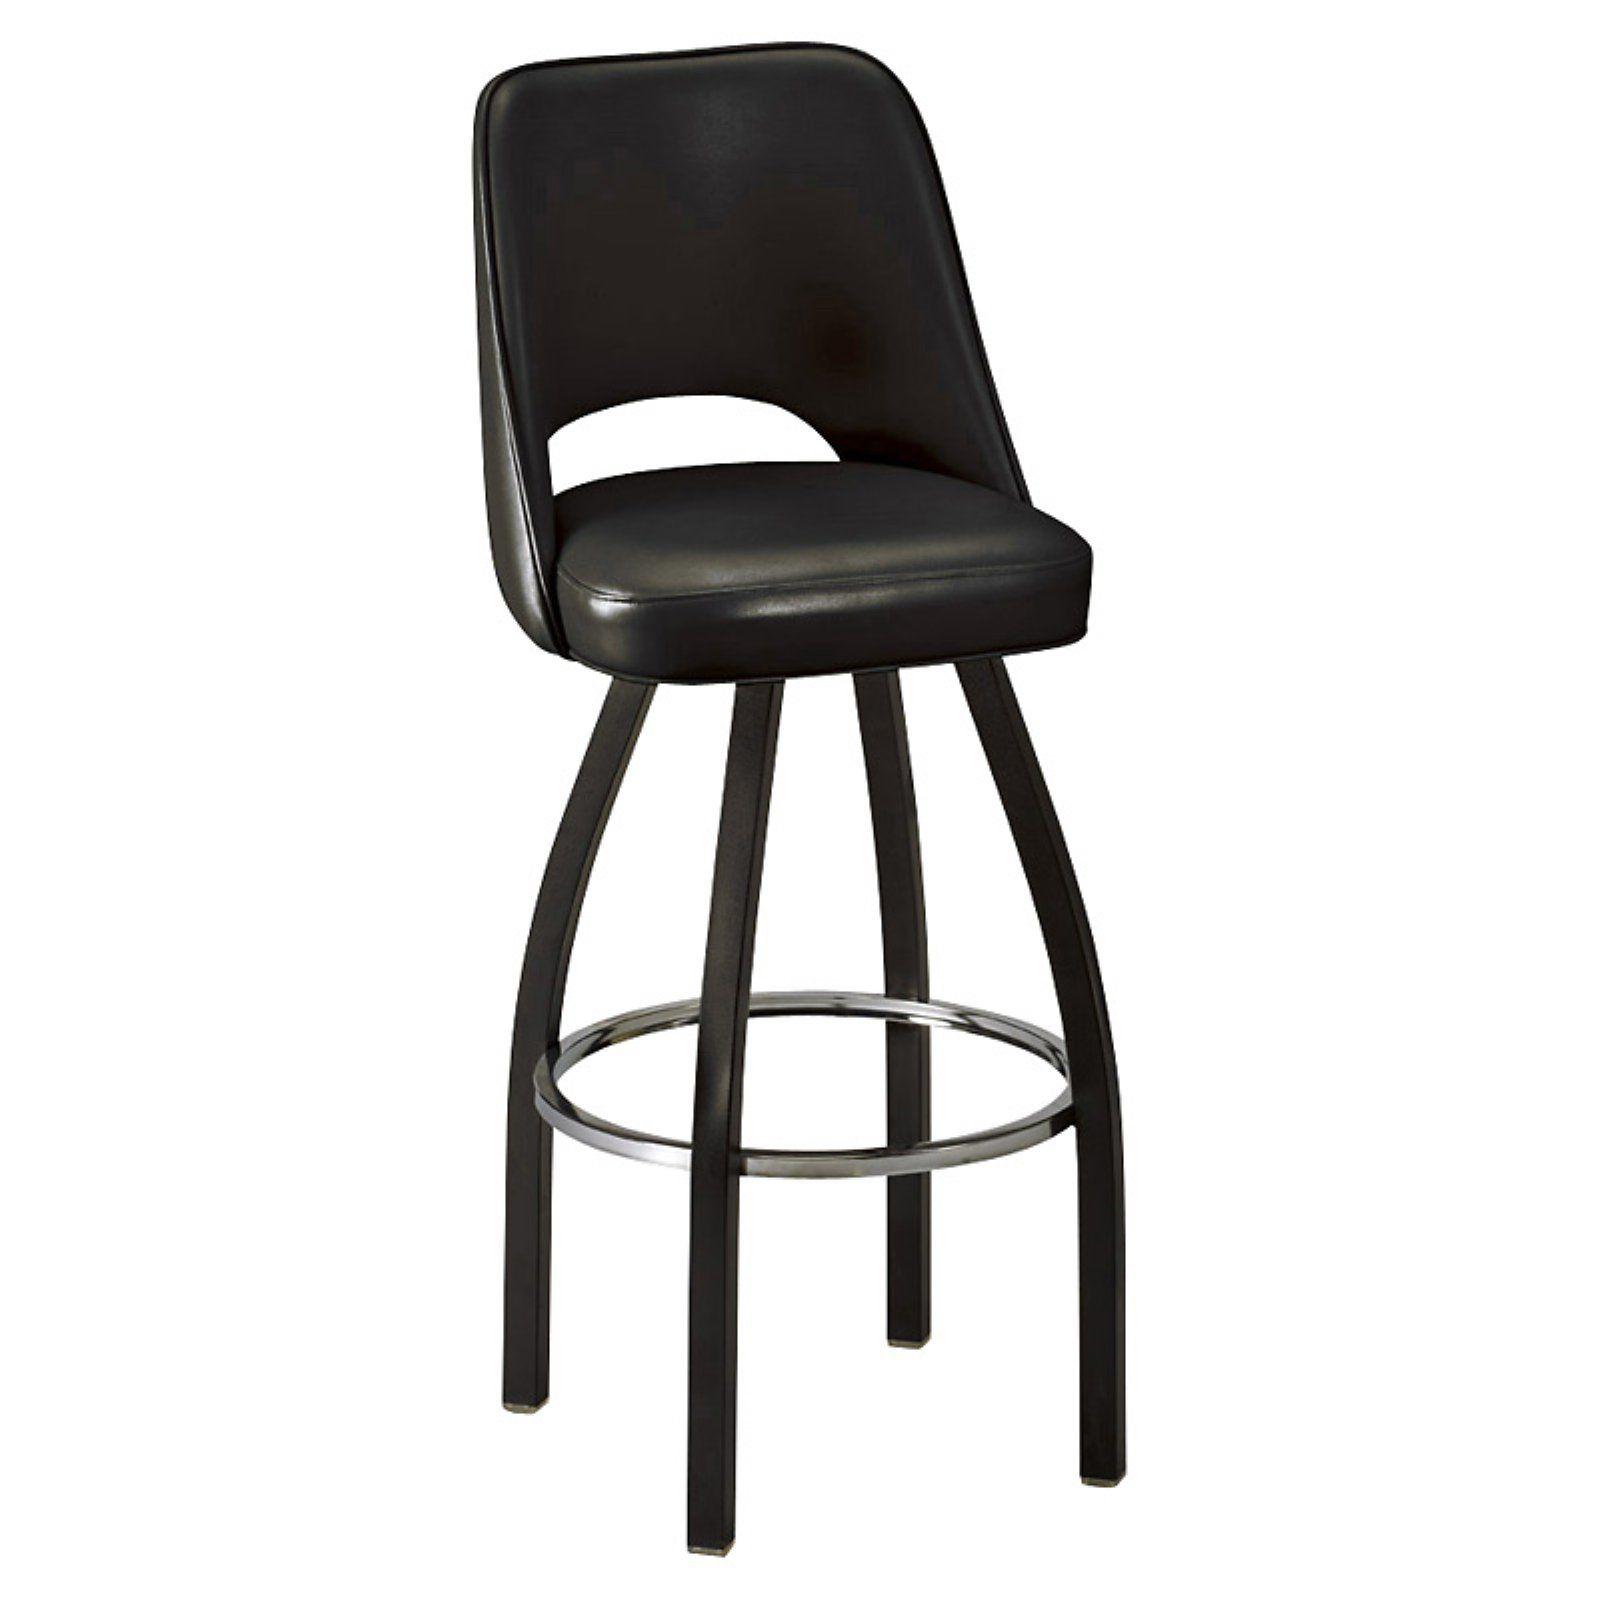 Regal 30 Inch Fillmore Bucket Seat Swivel Bar Stool Wine Bar